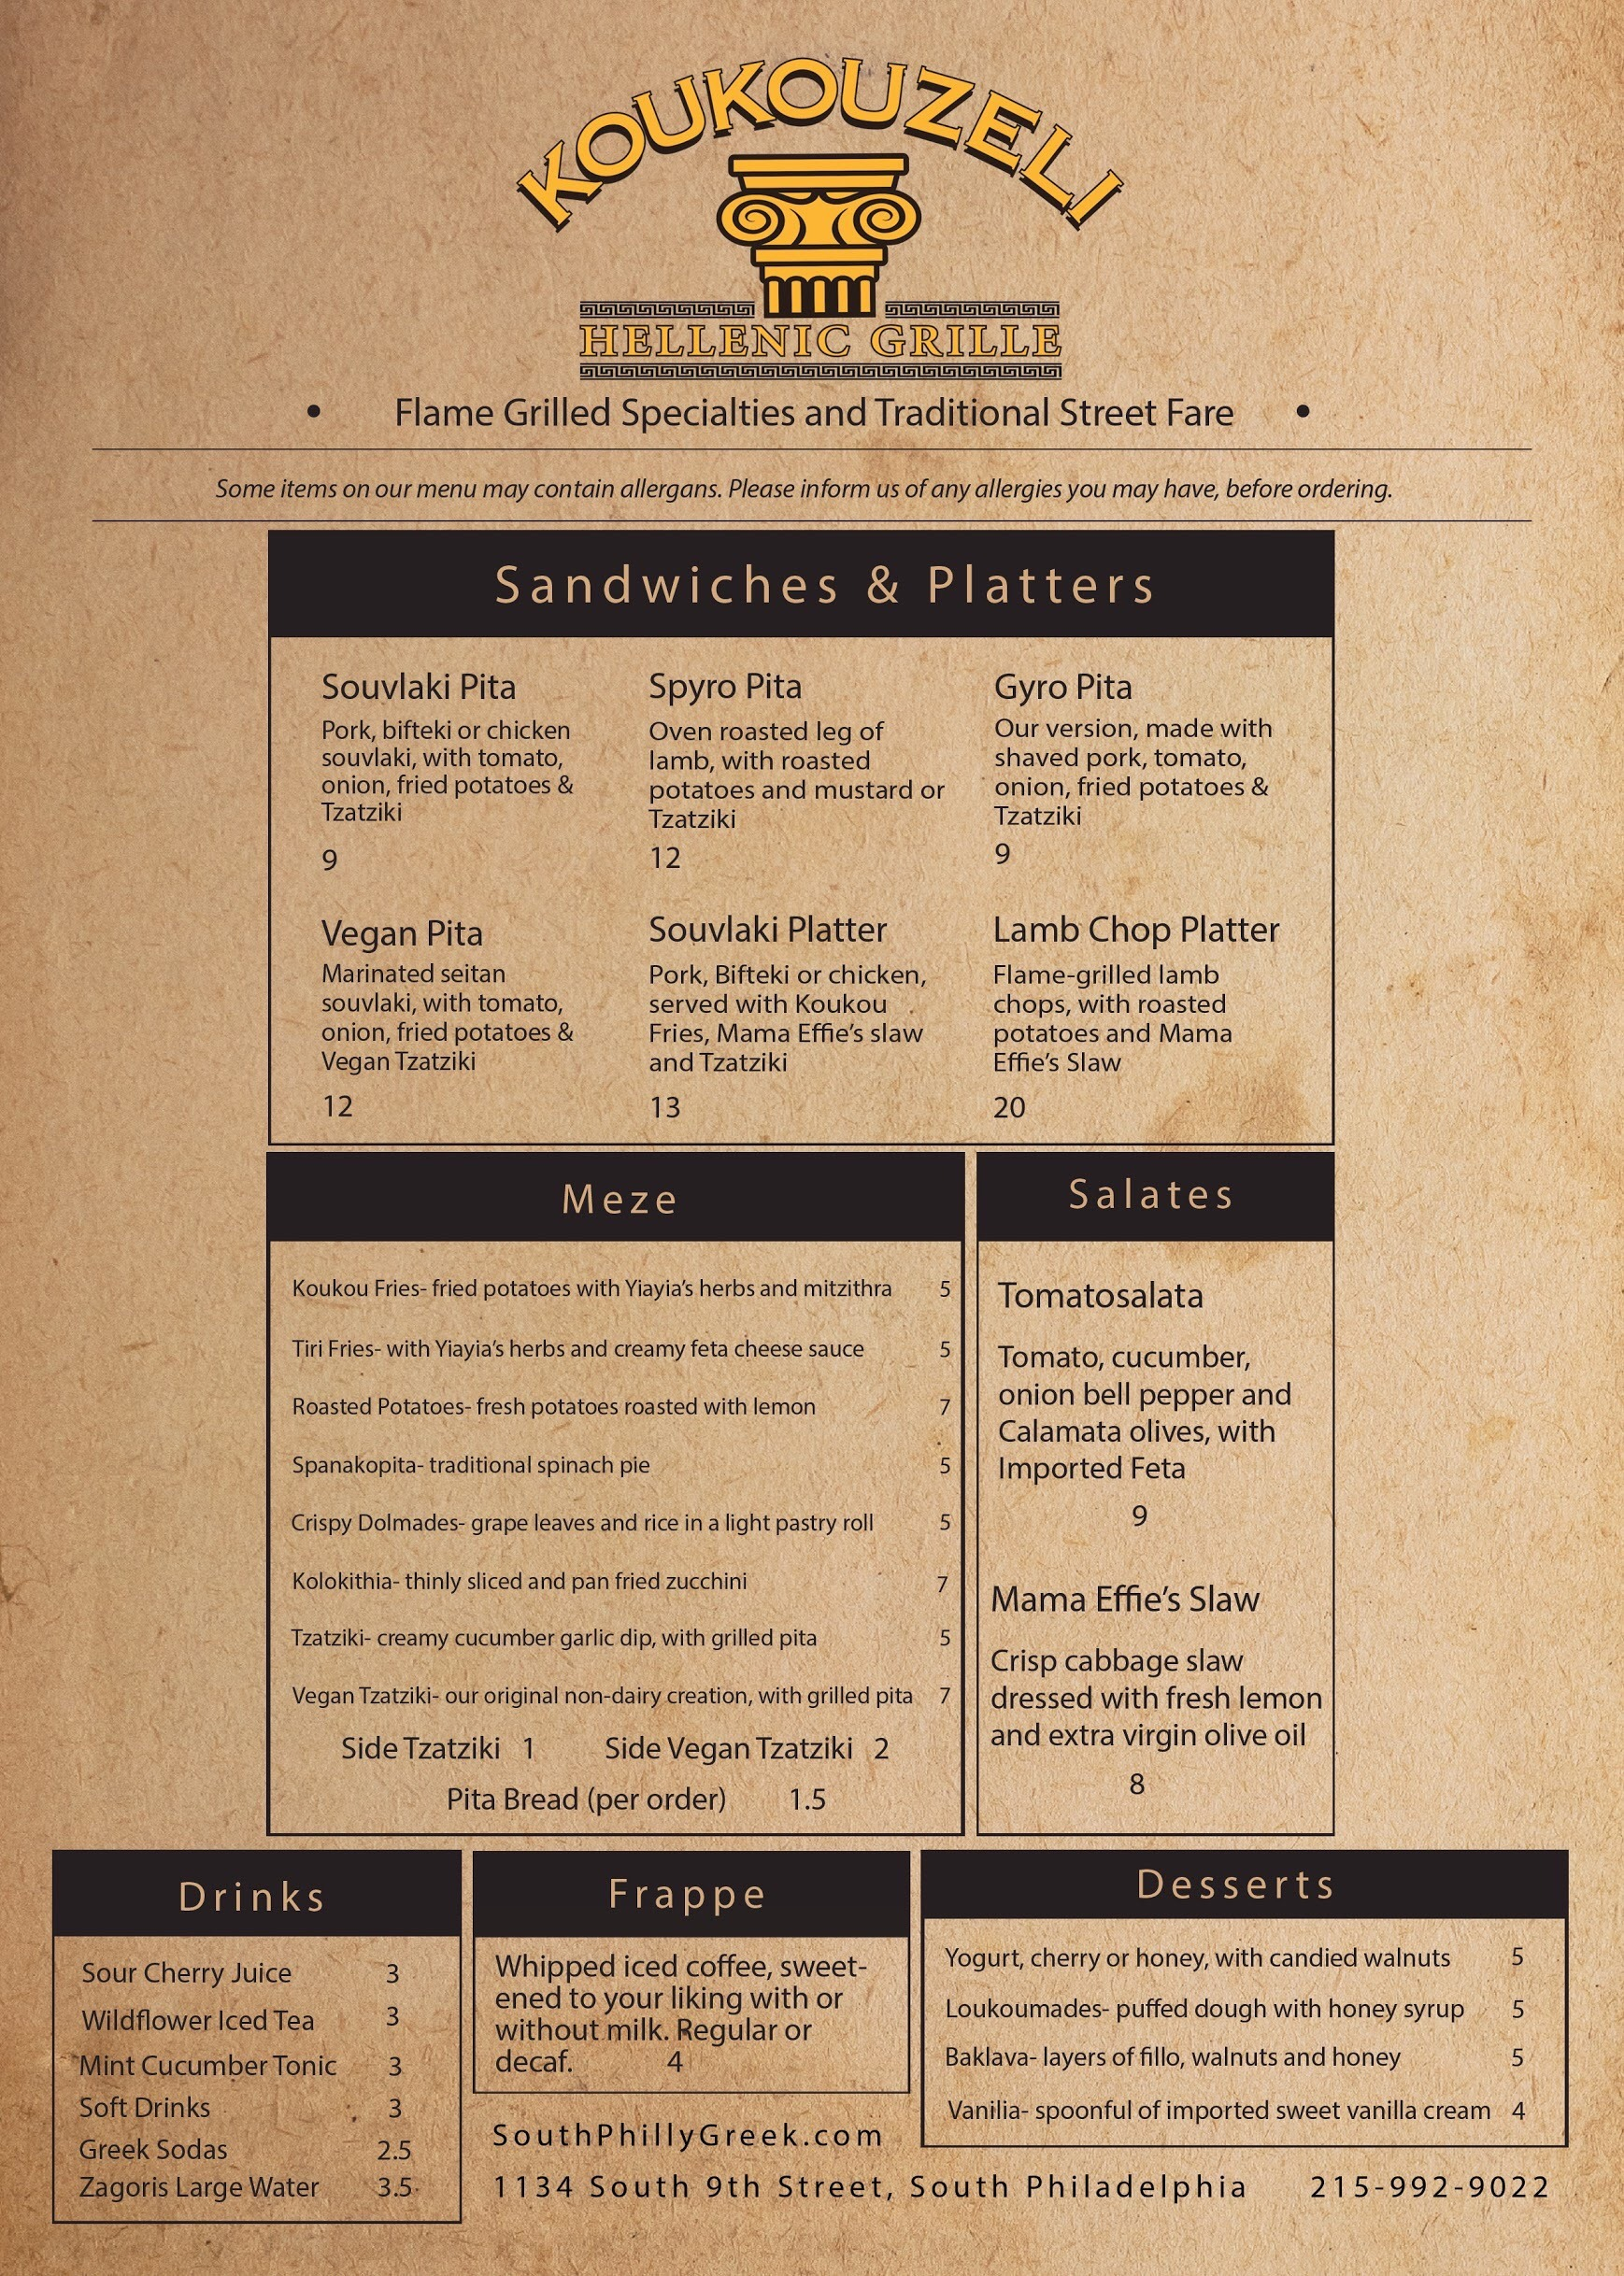 koukouzeli grille menu